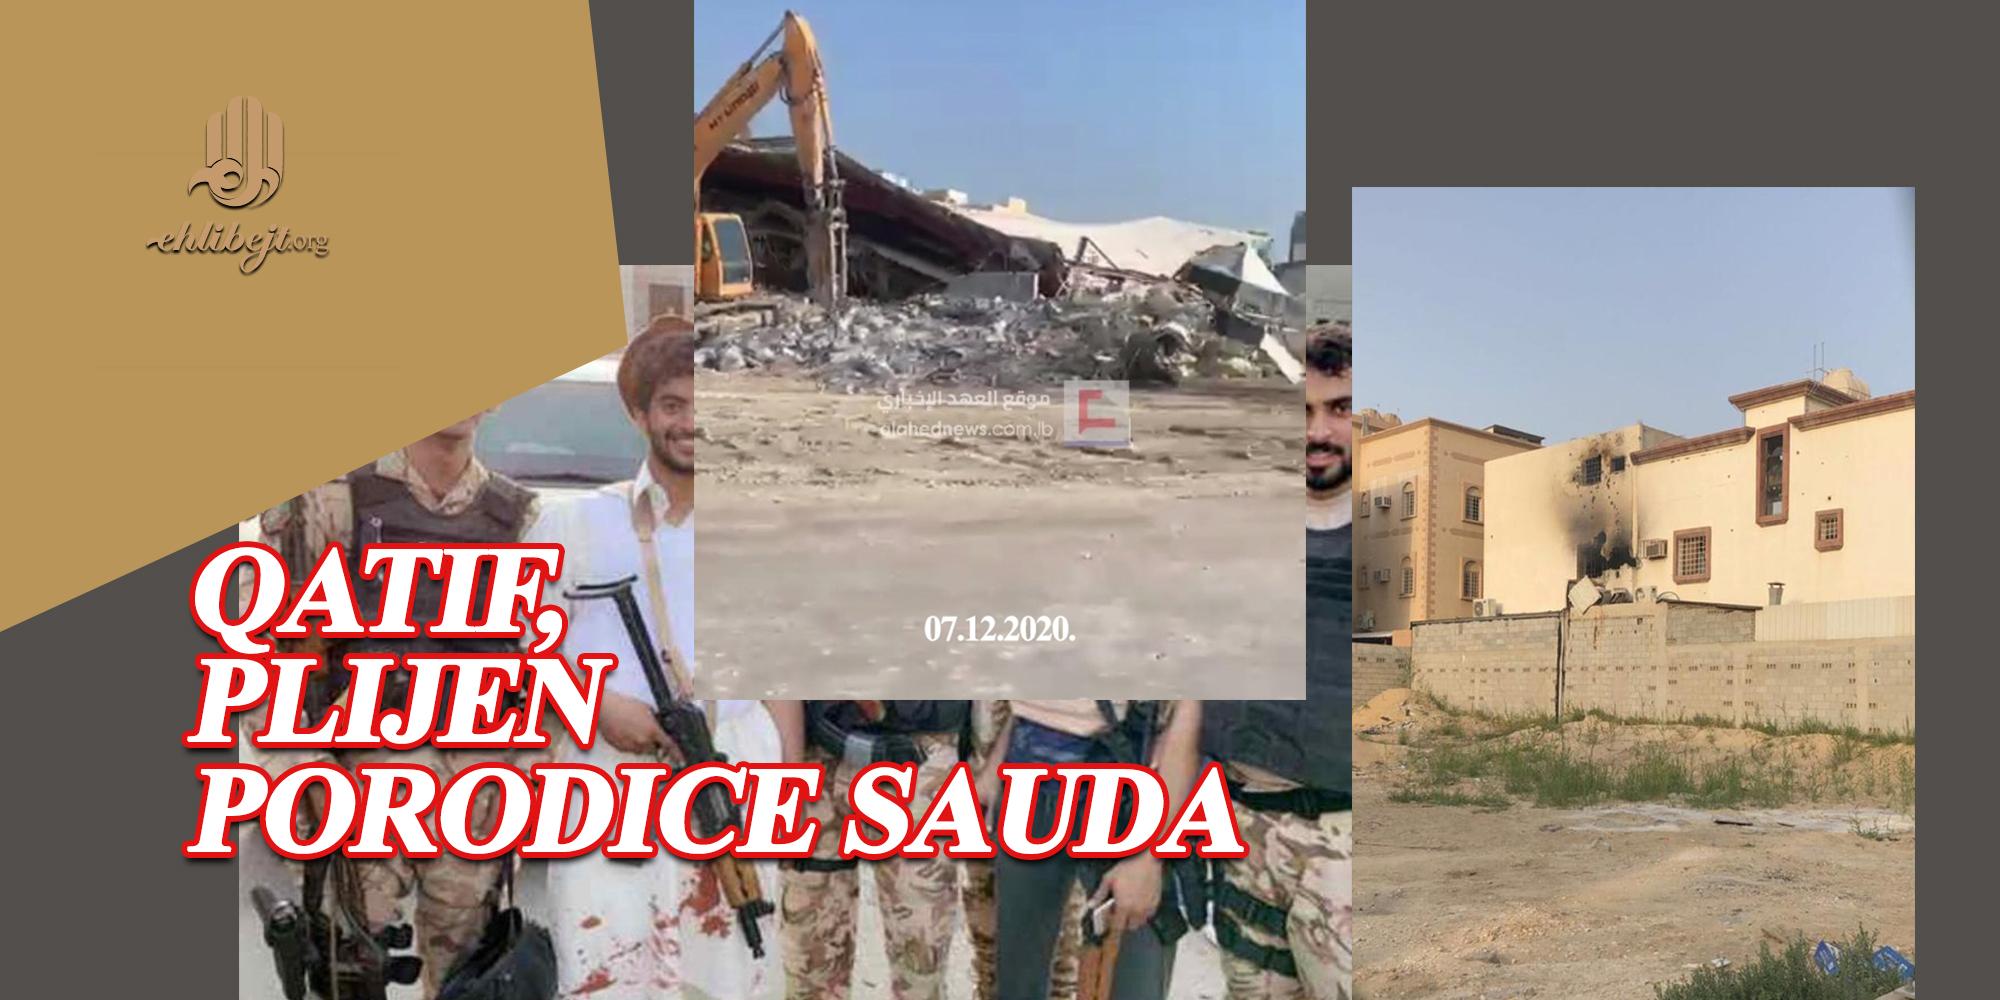 Qatif, plijen porodice Sauda